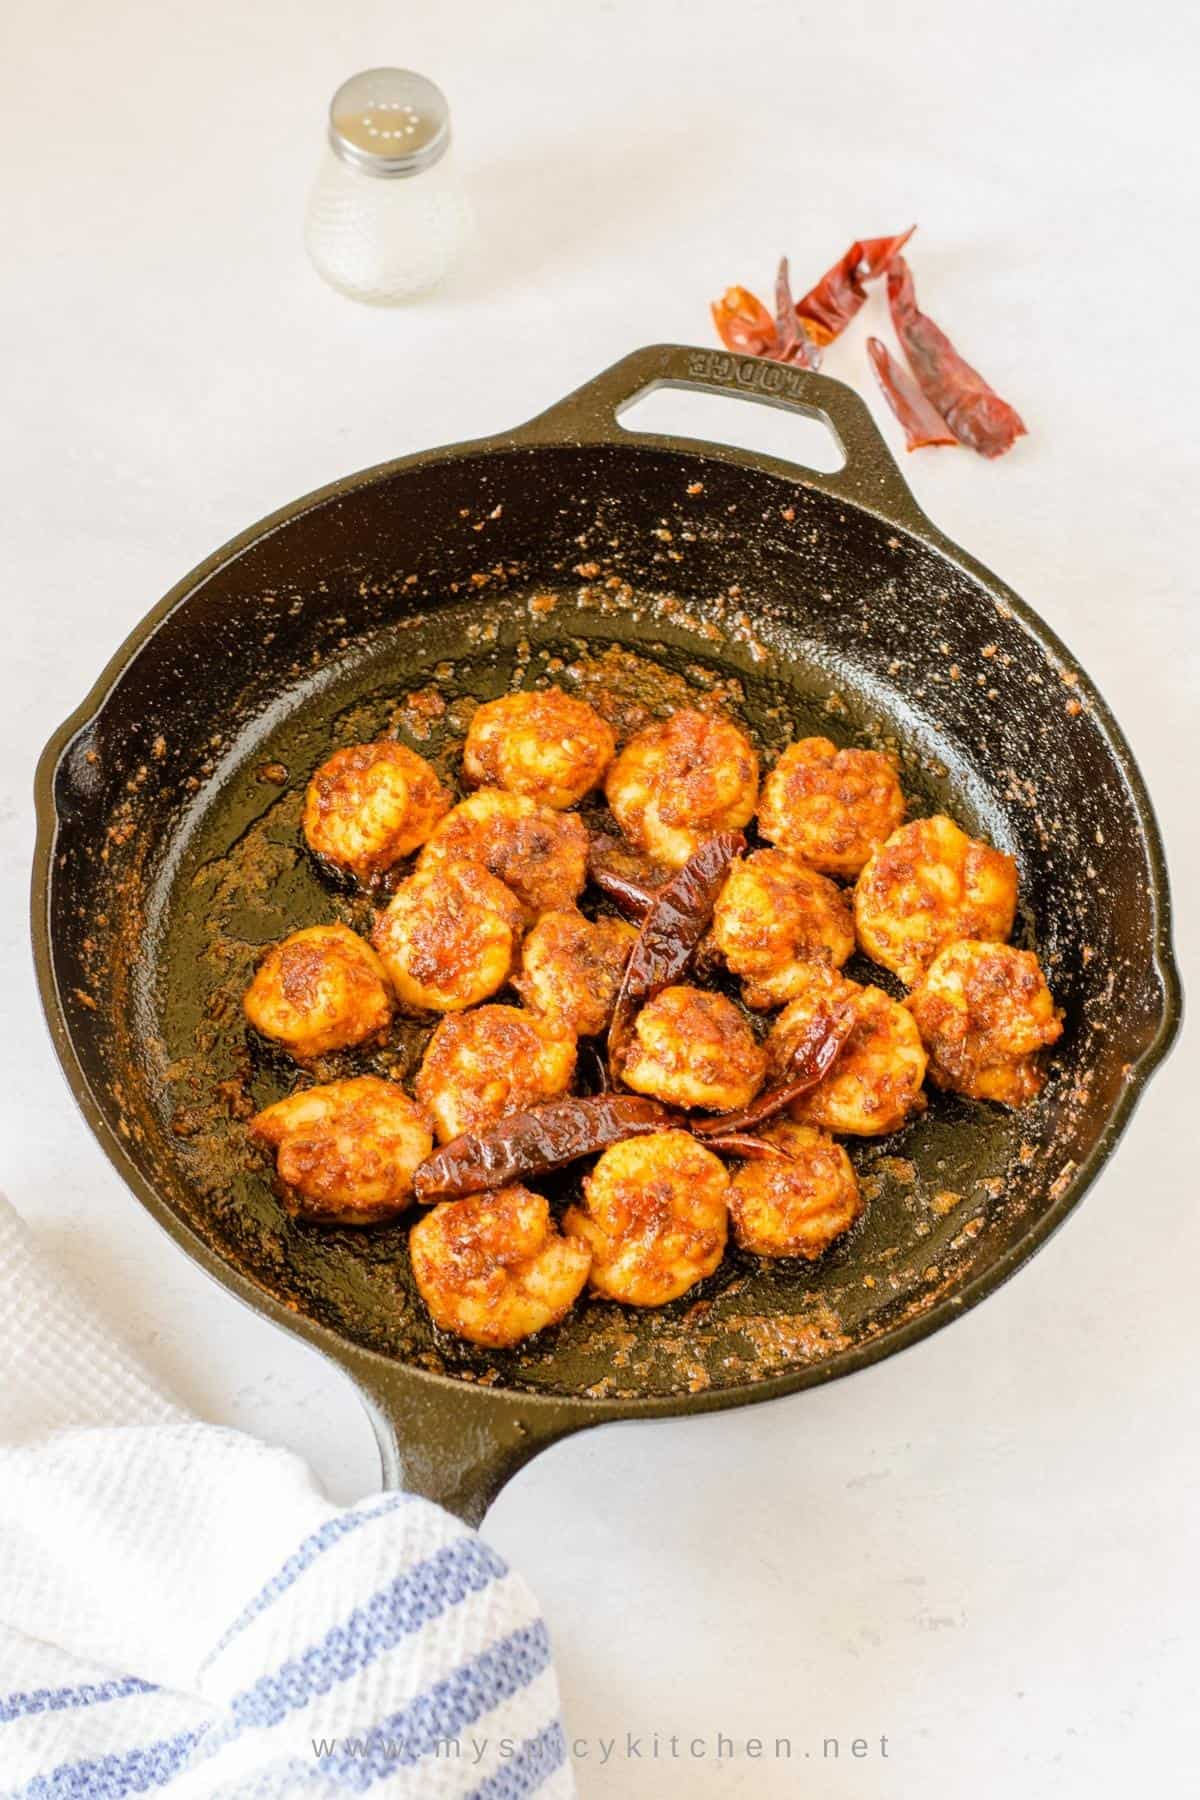 Chili garlic shrimp in a cast iron pan.